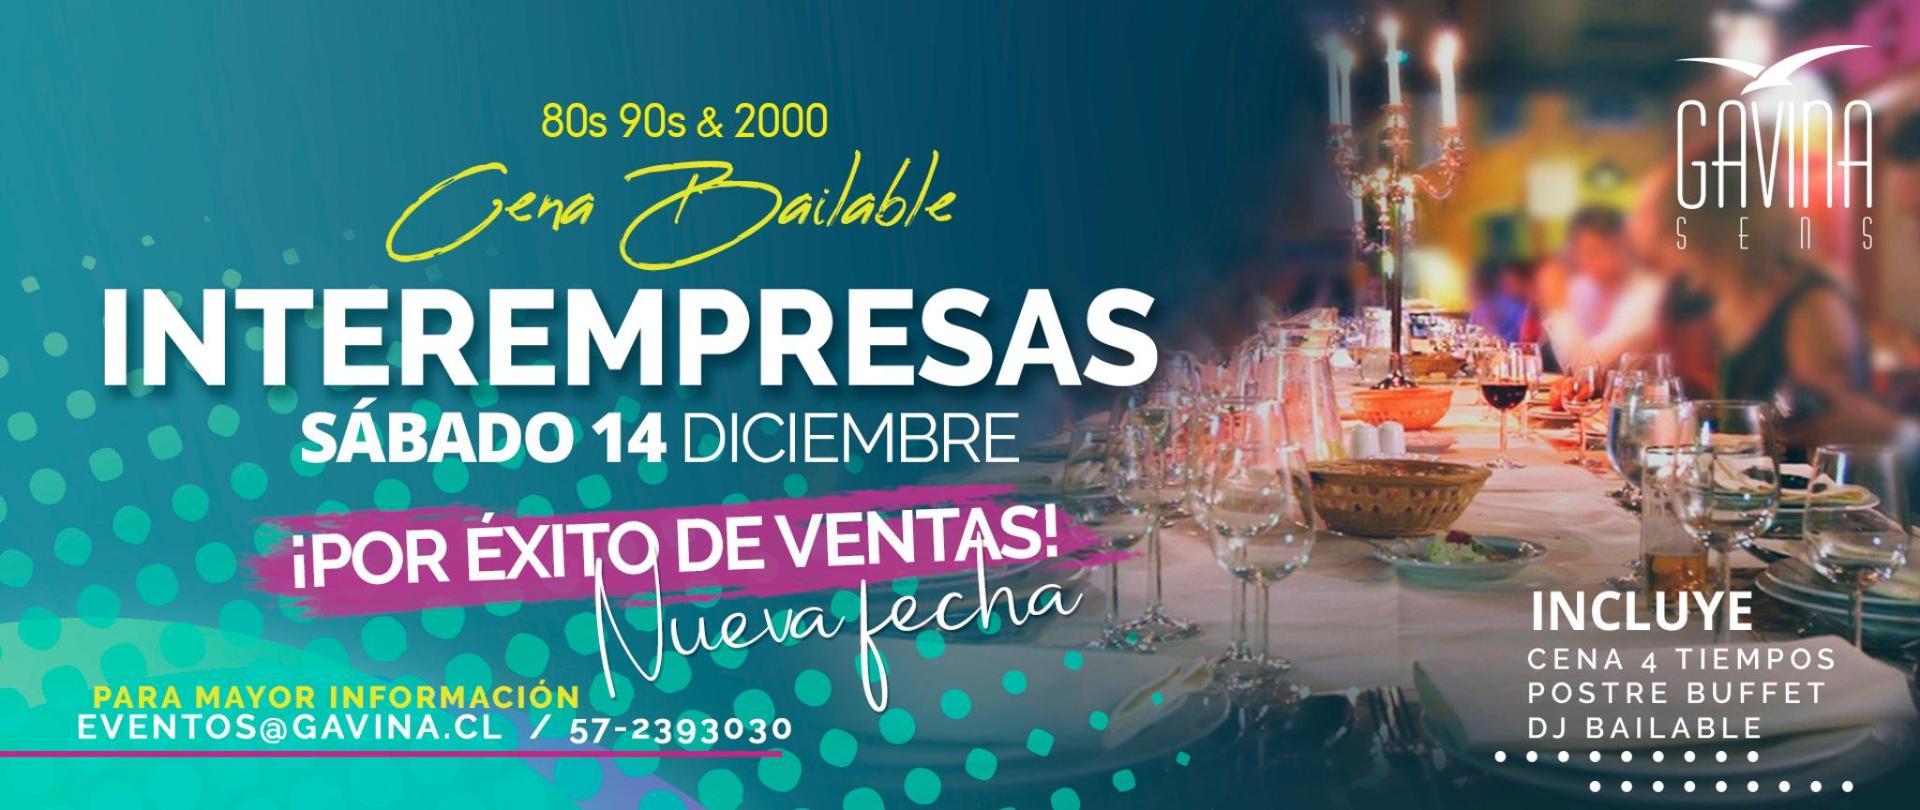 INTEREMPRESAS 2019 banner web.jpg